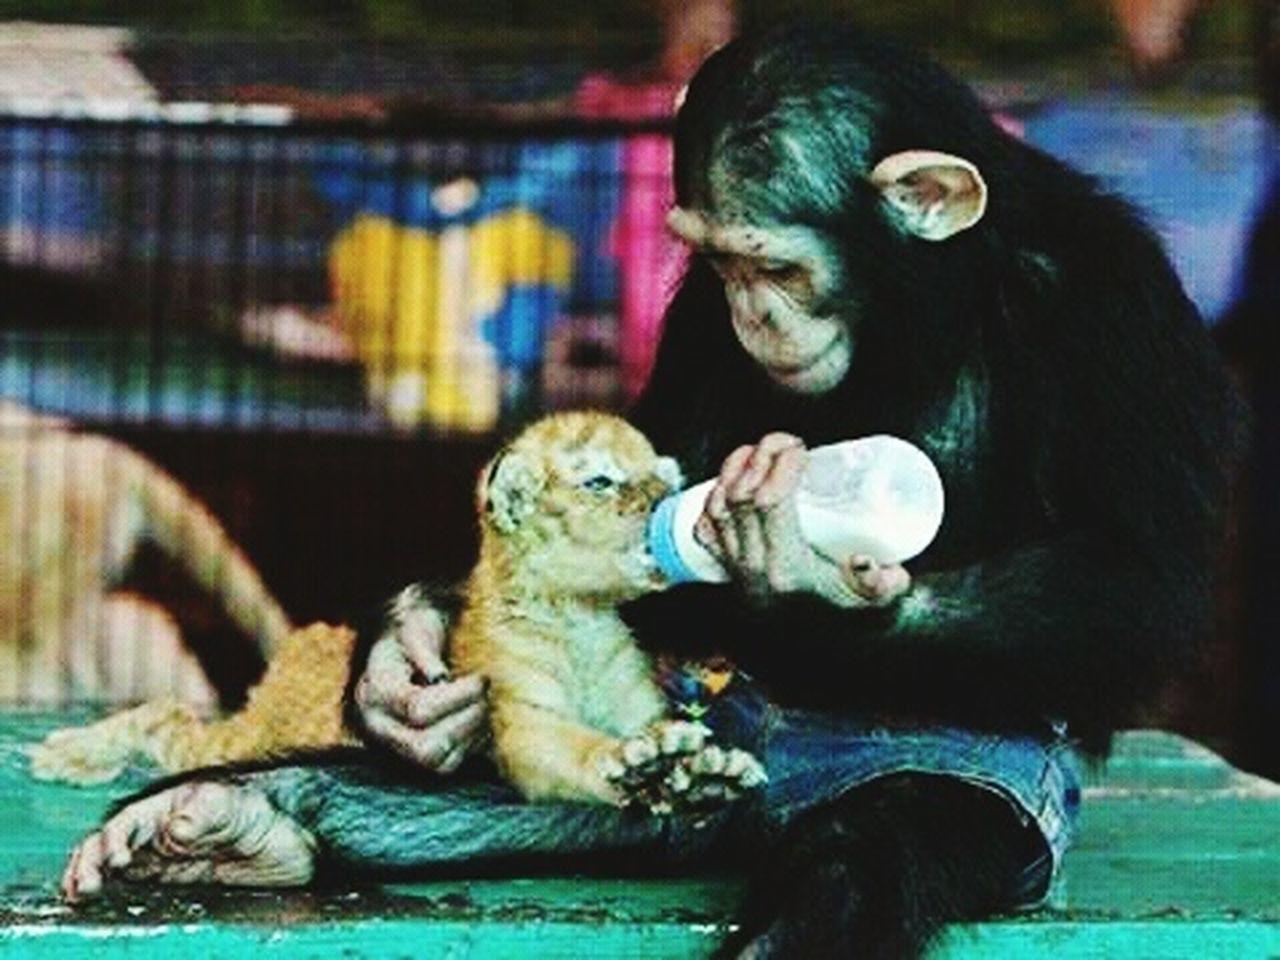 primate, animal, animal themes, animals in captivity, chimpanzee, one animal, animal wildlife, mammal, monkey, full length, ape, sitting, animals in the wild, young animal, outdoors, day, no people